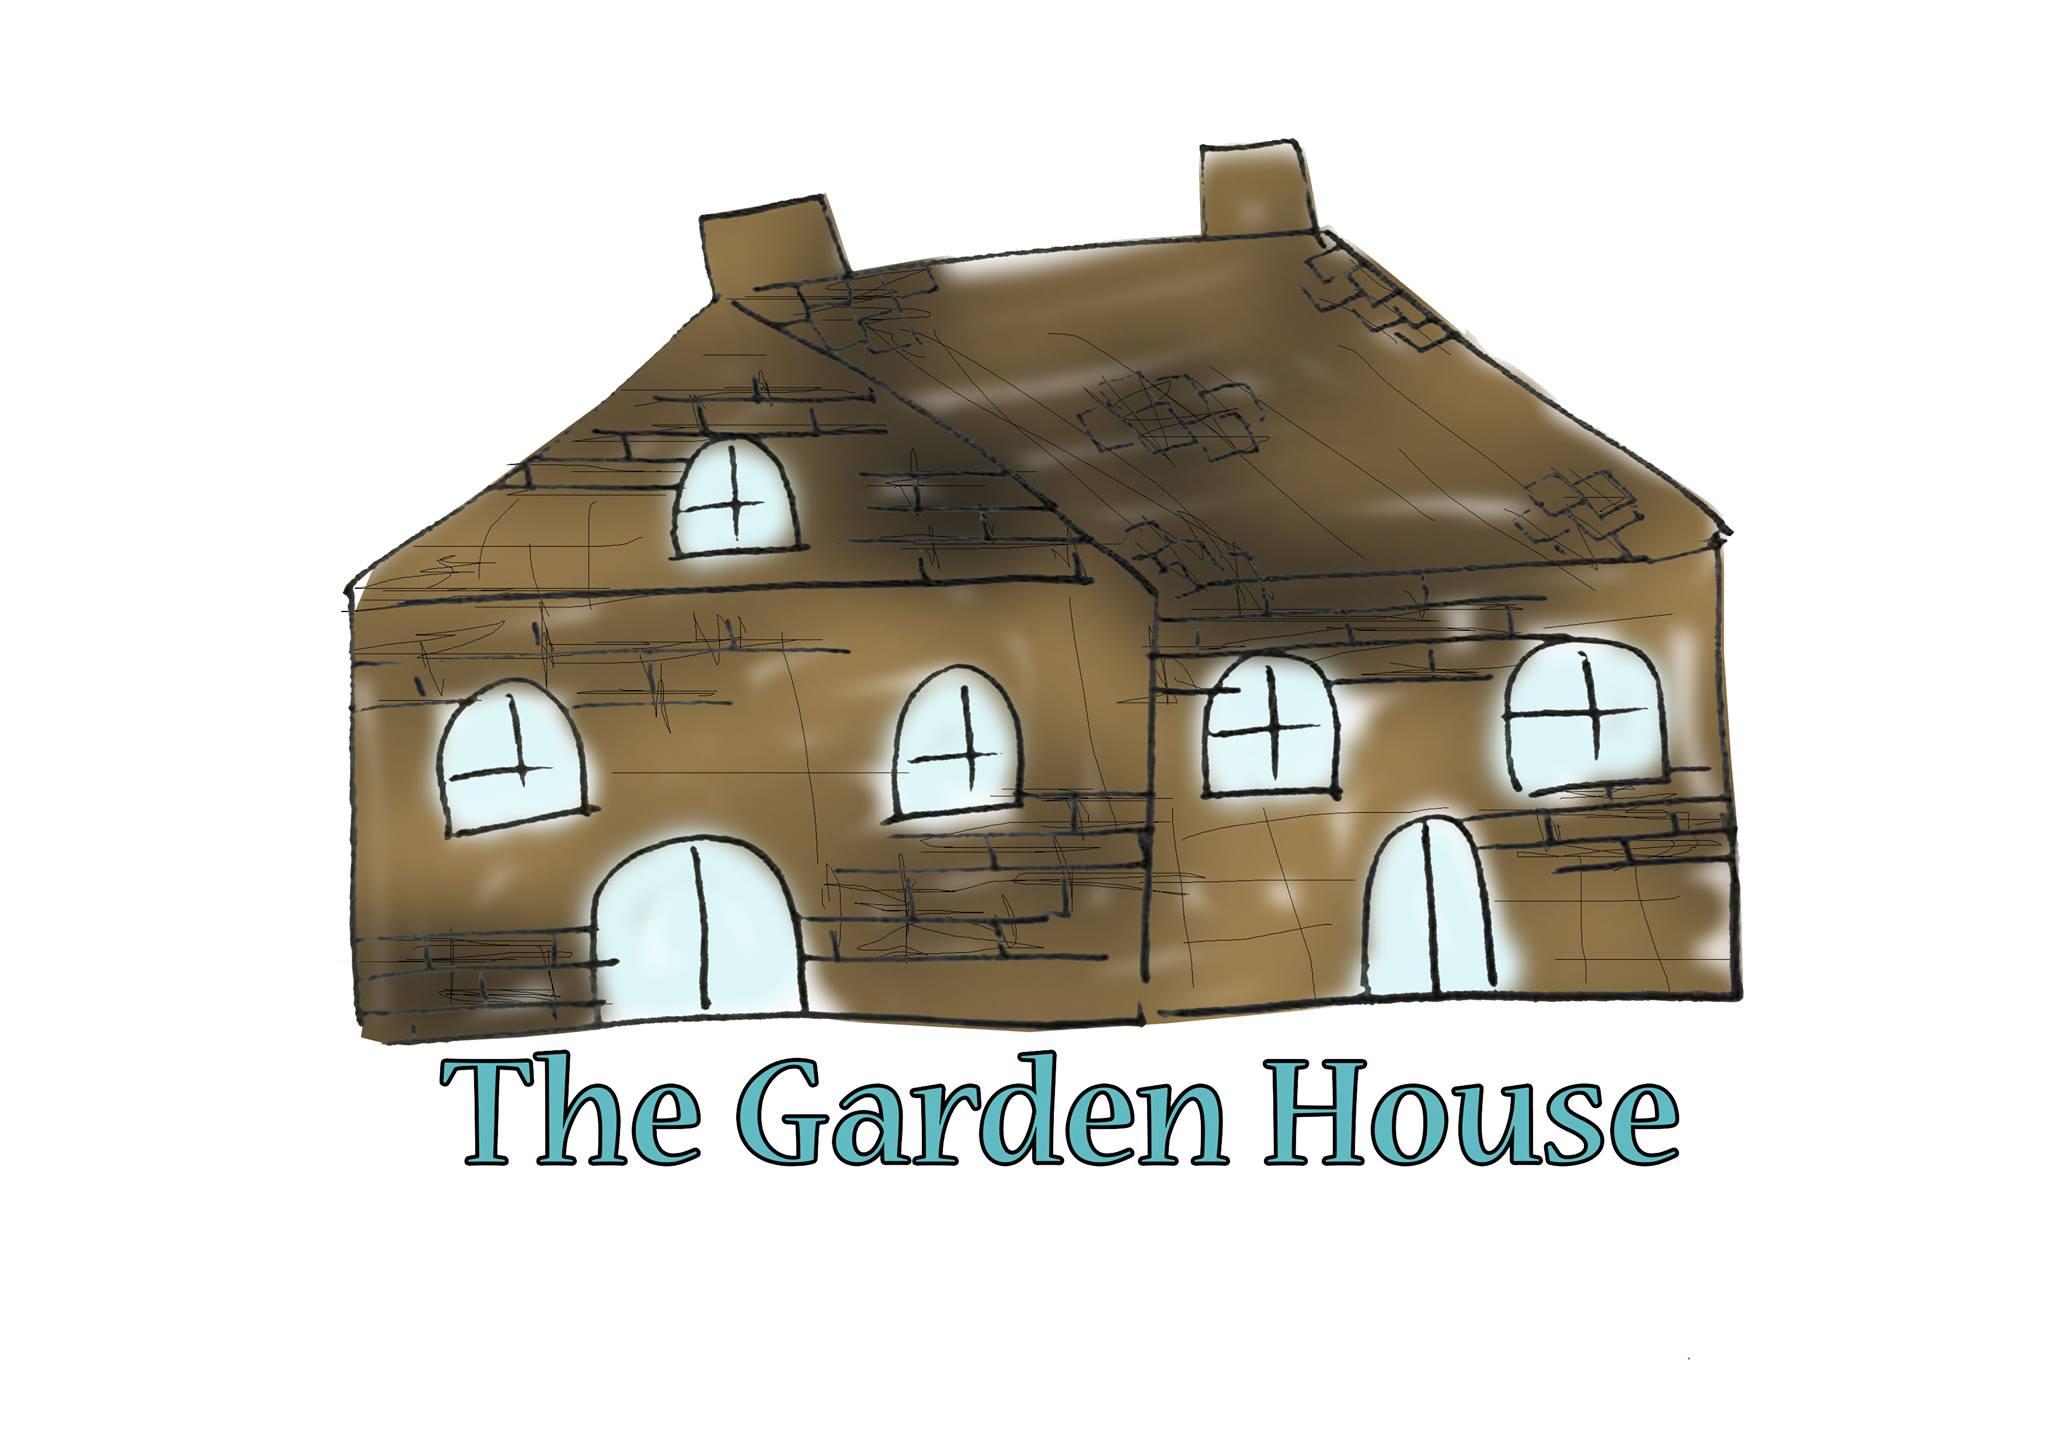 The Garden House (Marple) Charity